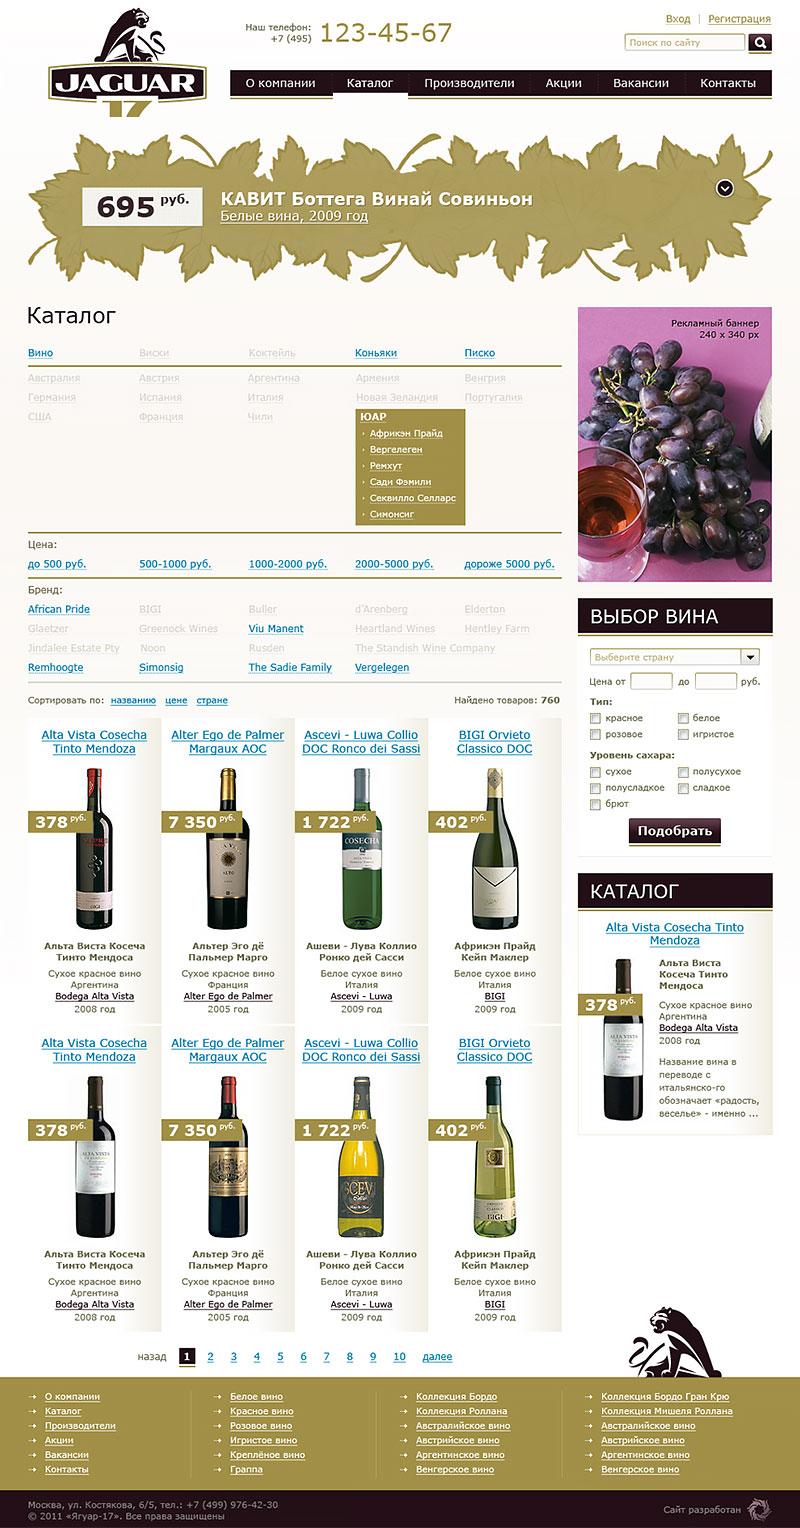 Three Level Catalog. Web Design for the Wine Online Store Jaguar-17